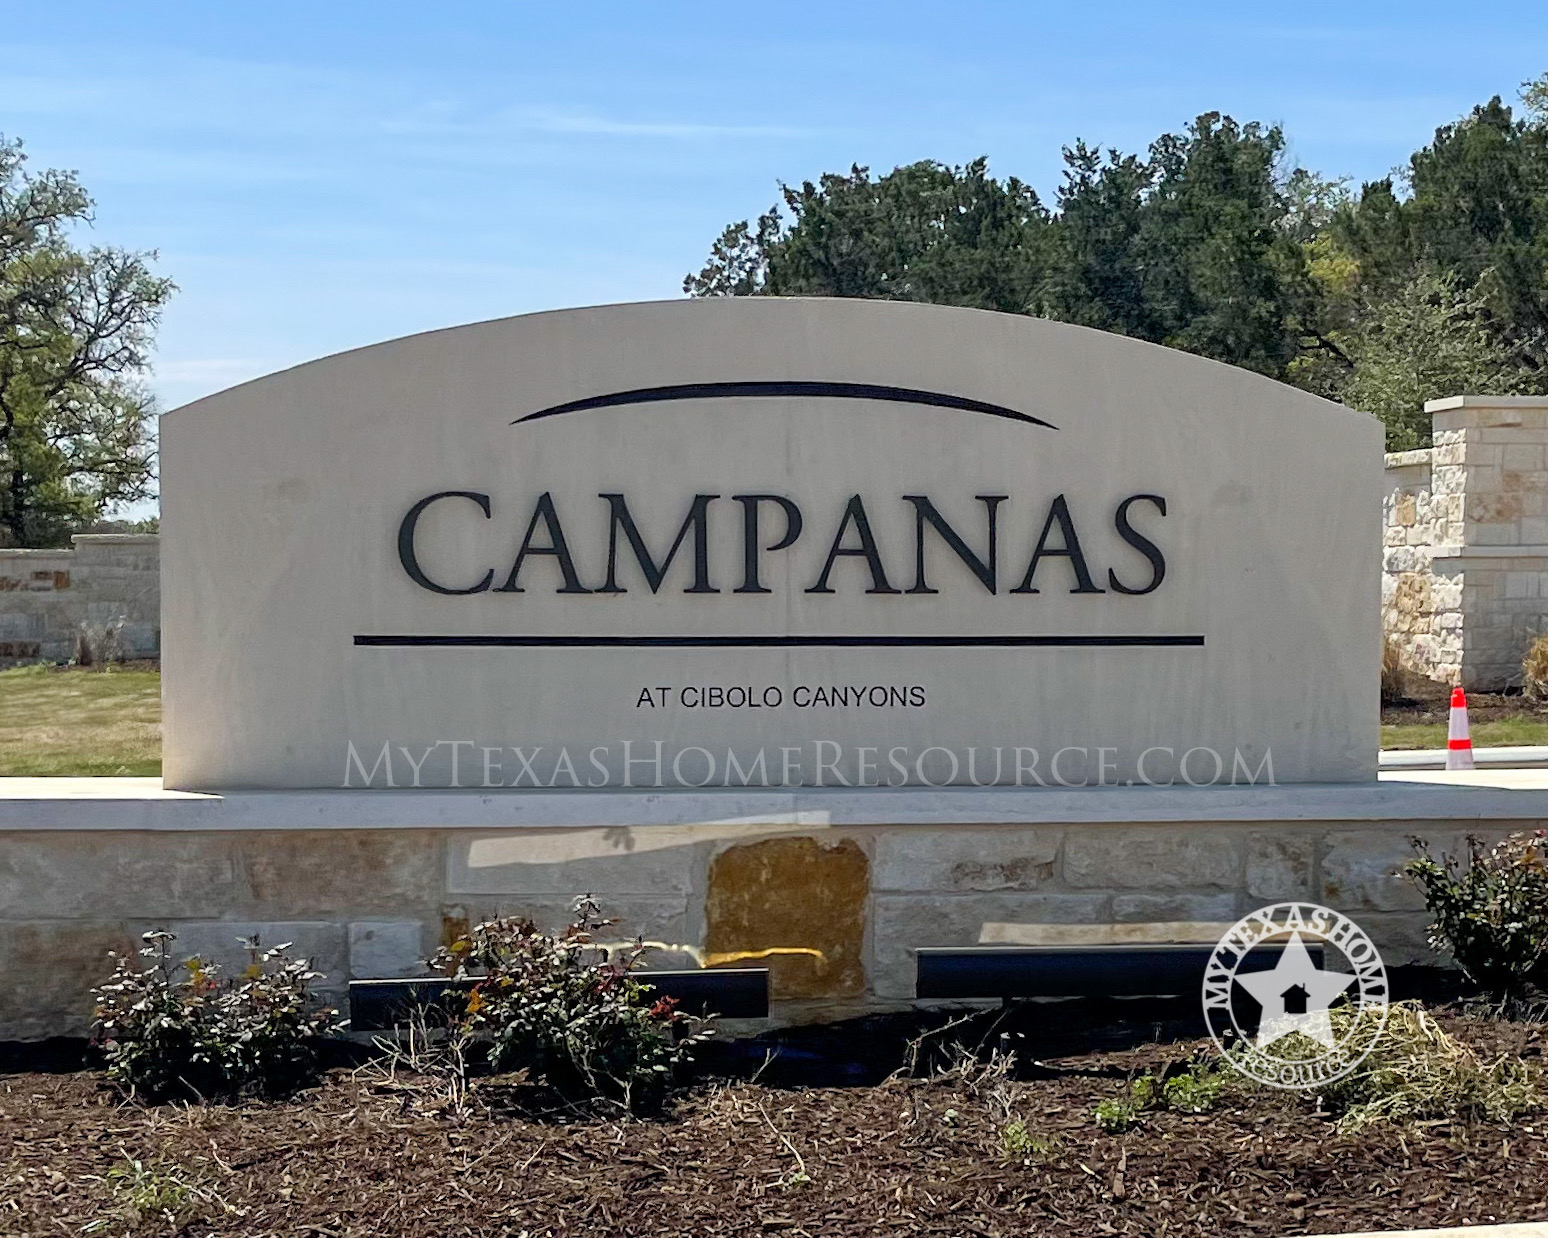 Campanas in Cibolo Canyond, San Antonio, TX